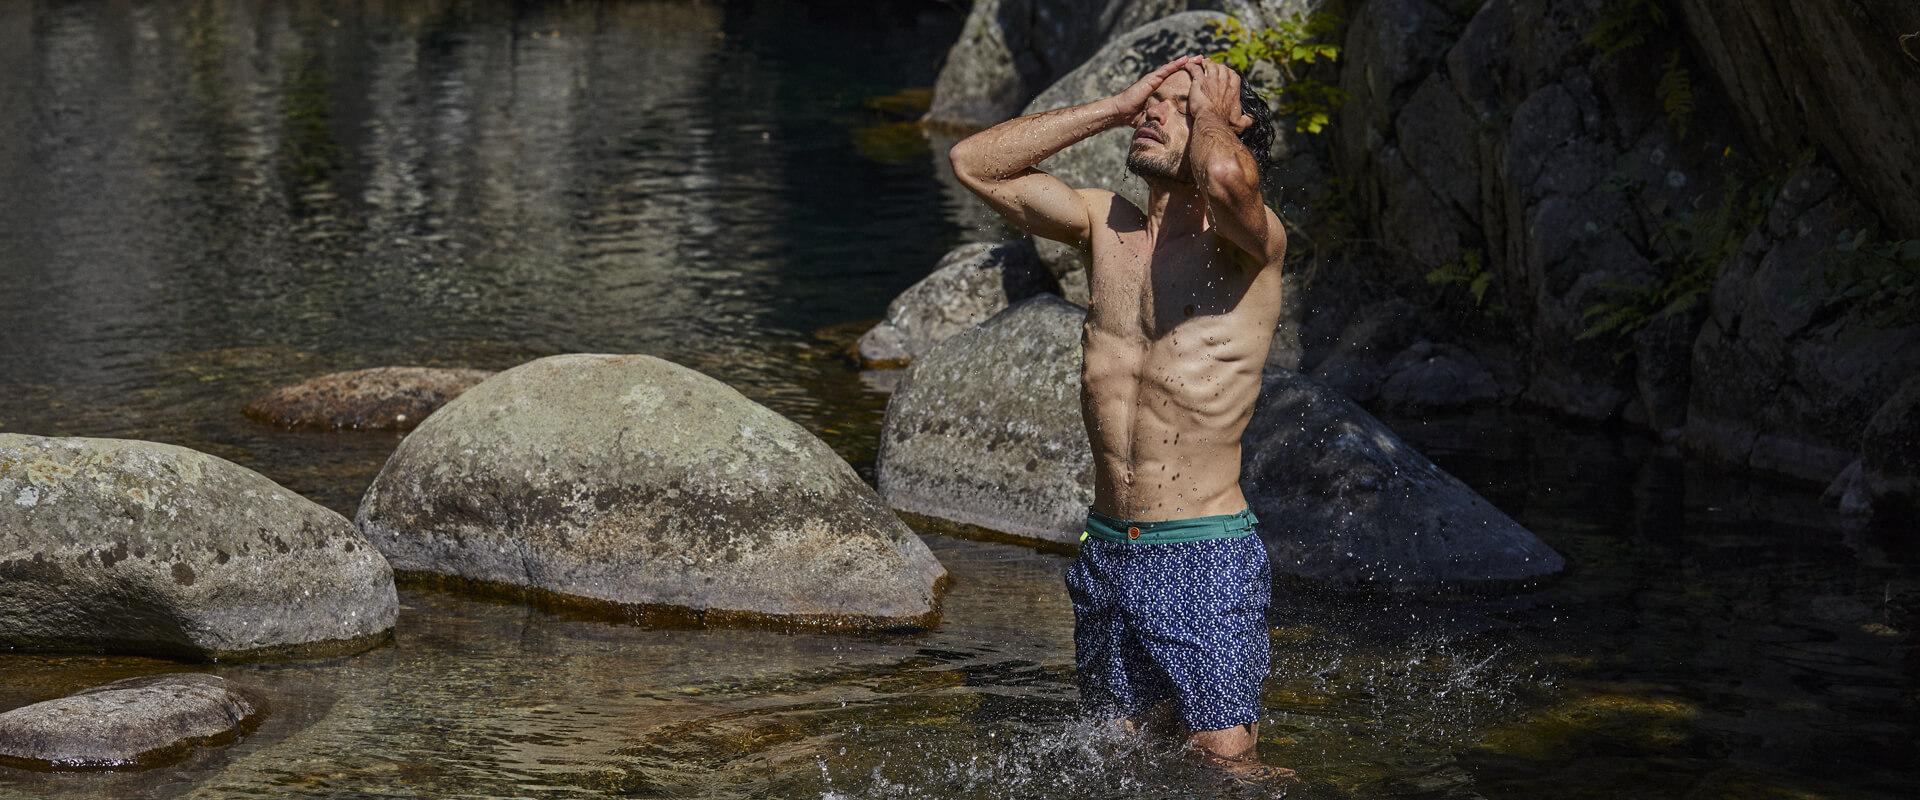 Choosing a good swimsuit for men: practical advice